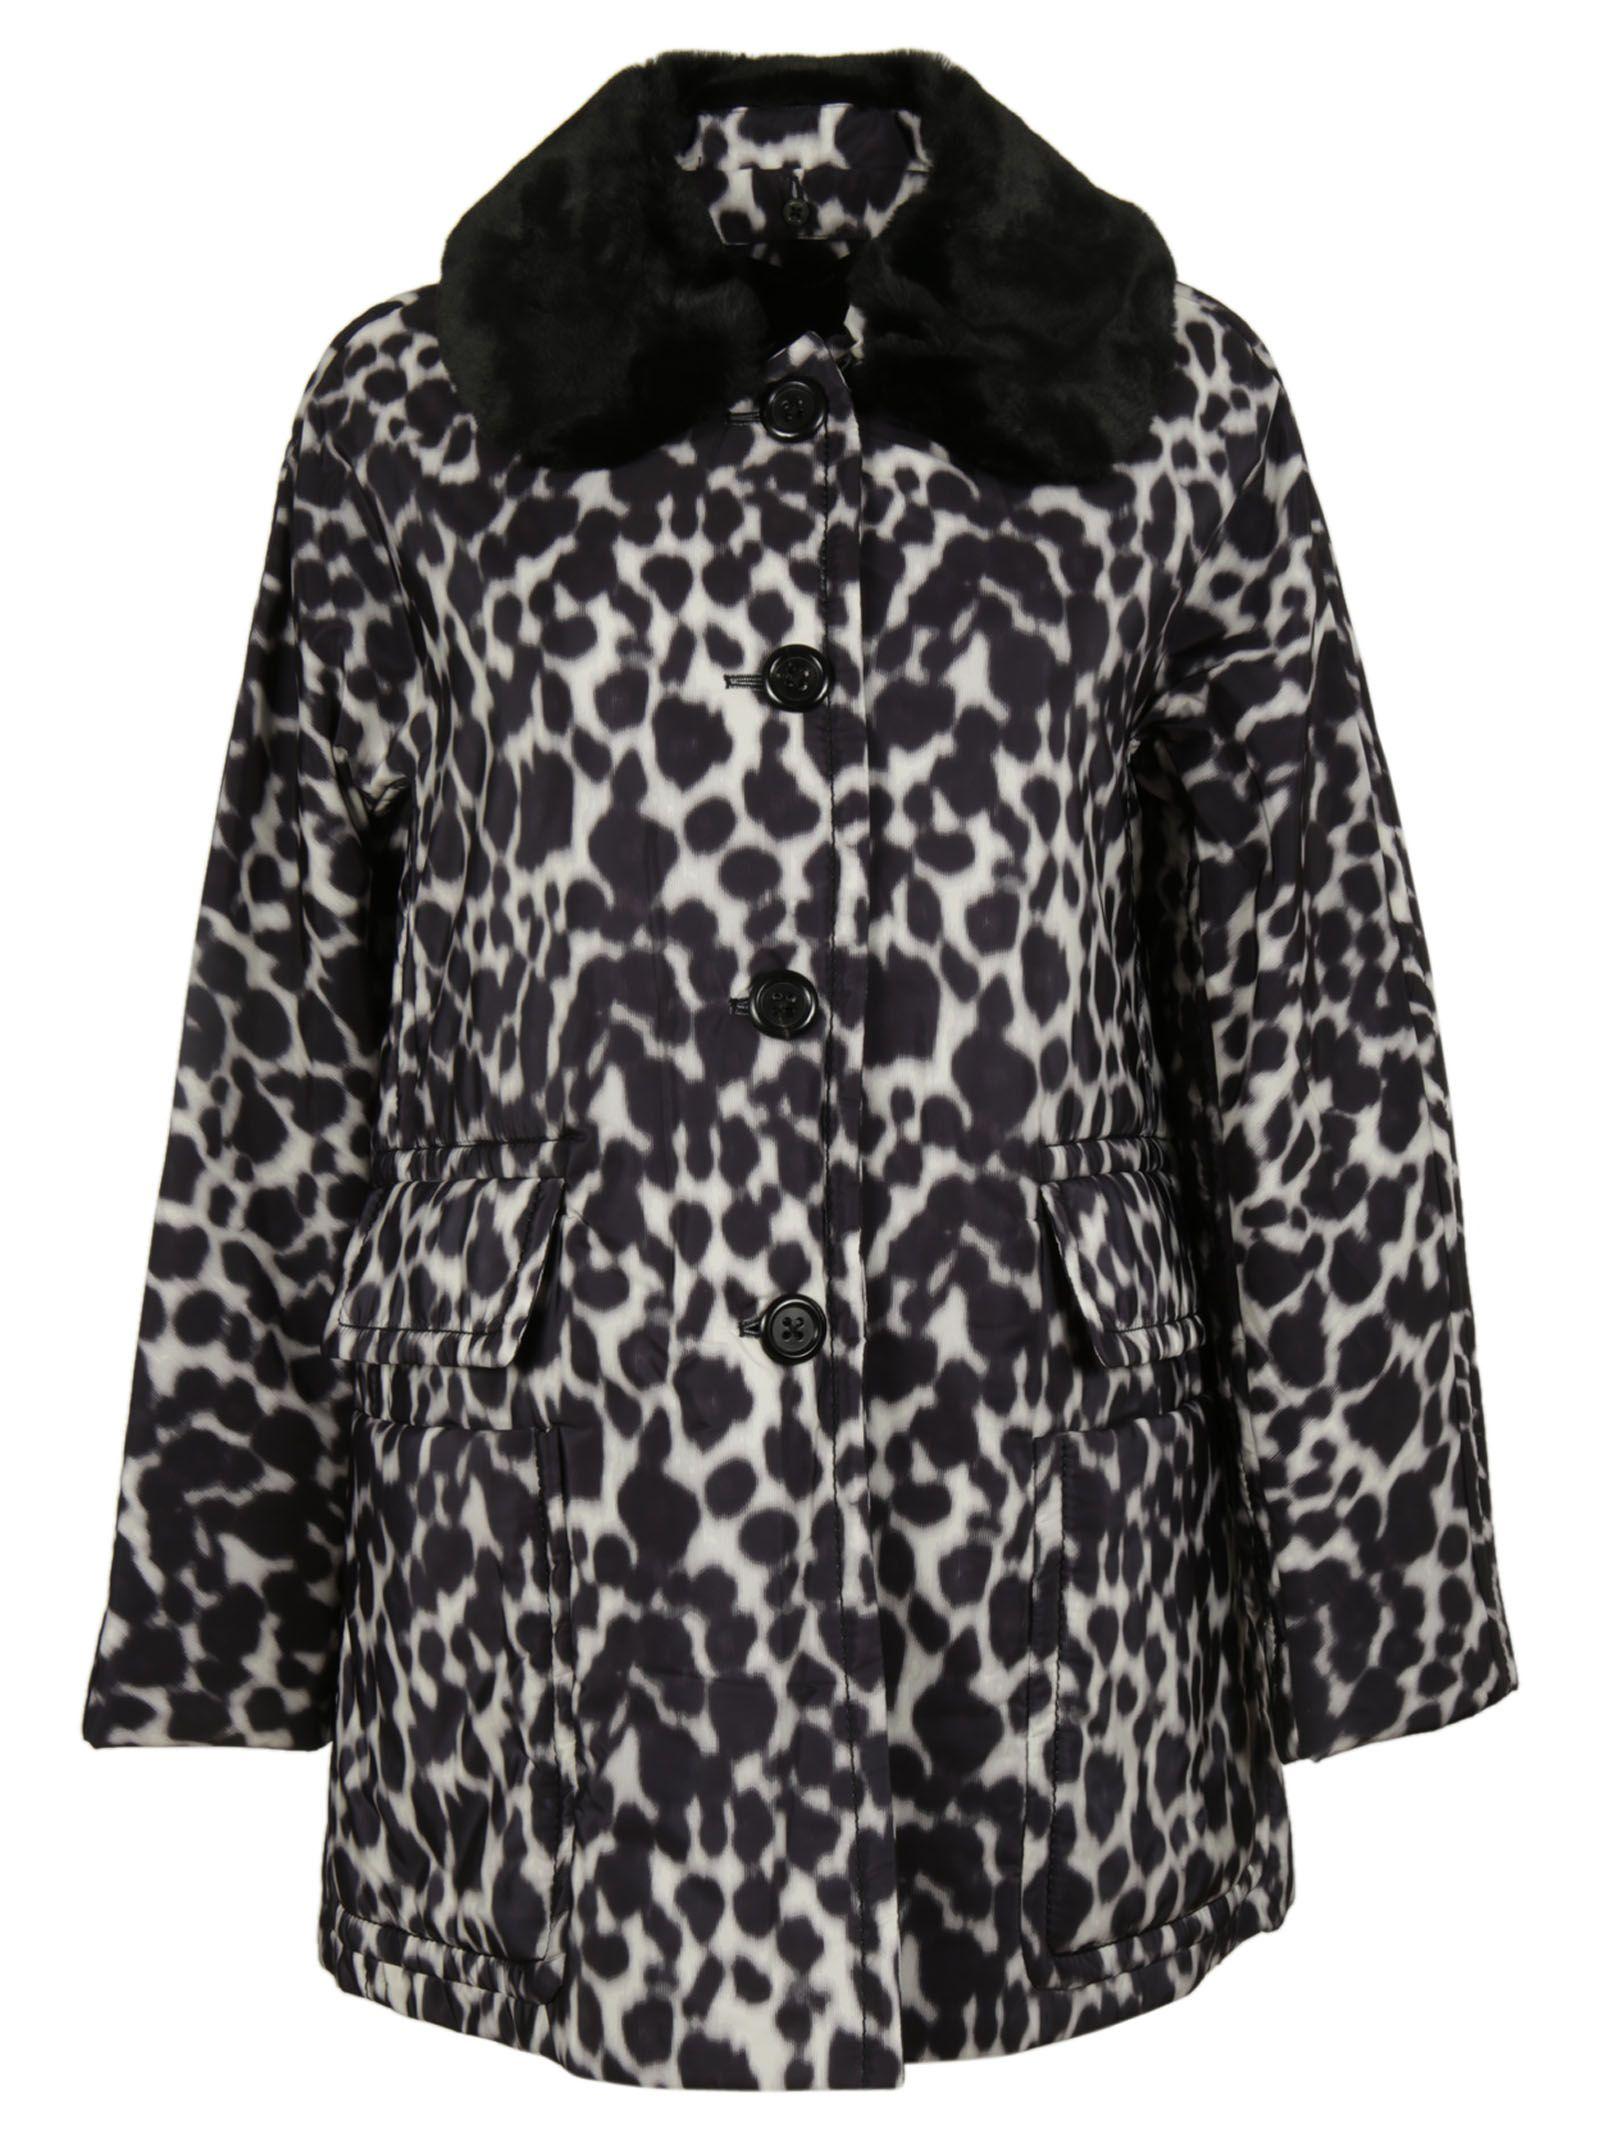 marc jacobs female 233680 ivory leopard print coat